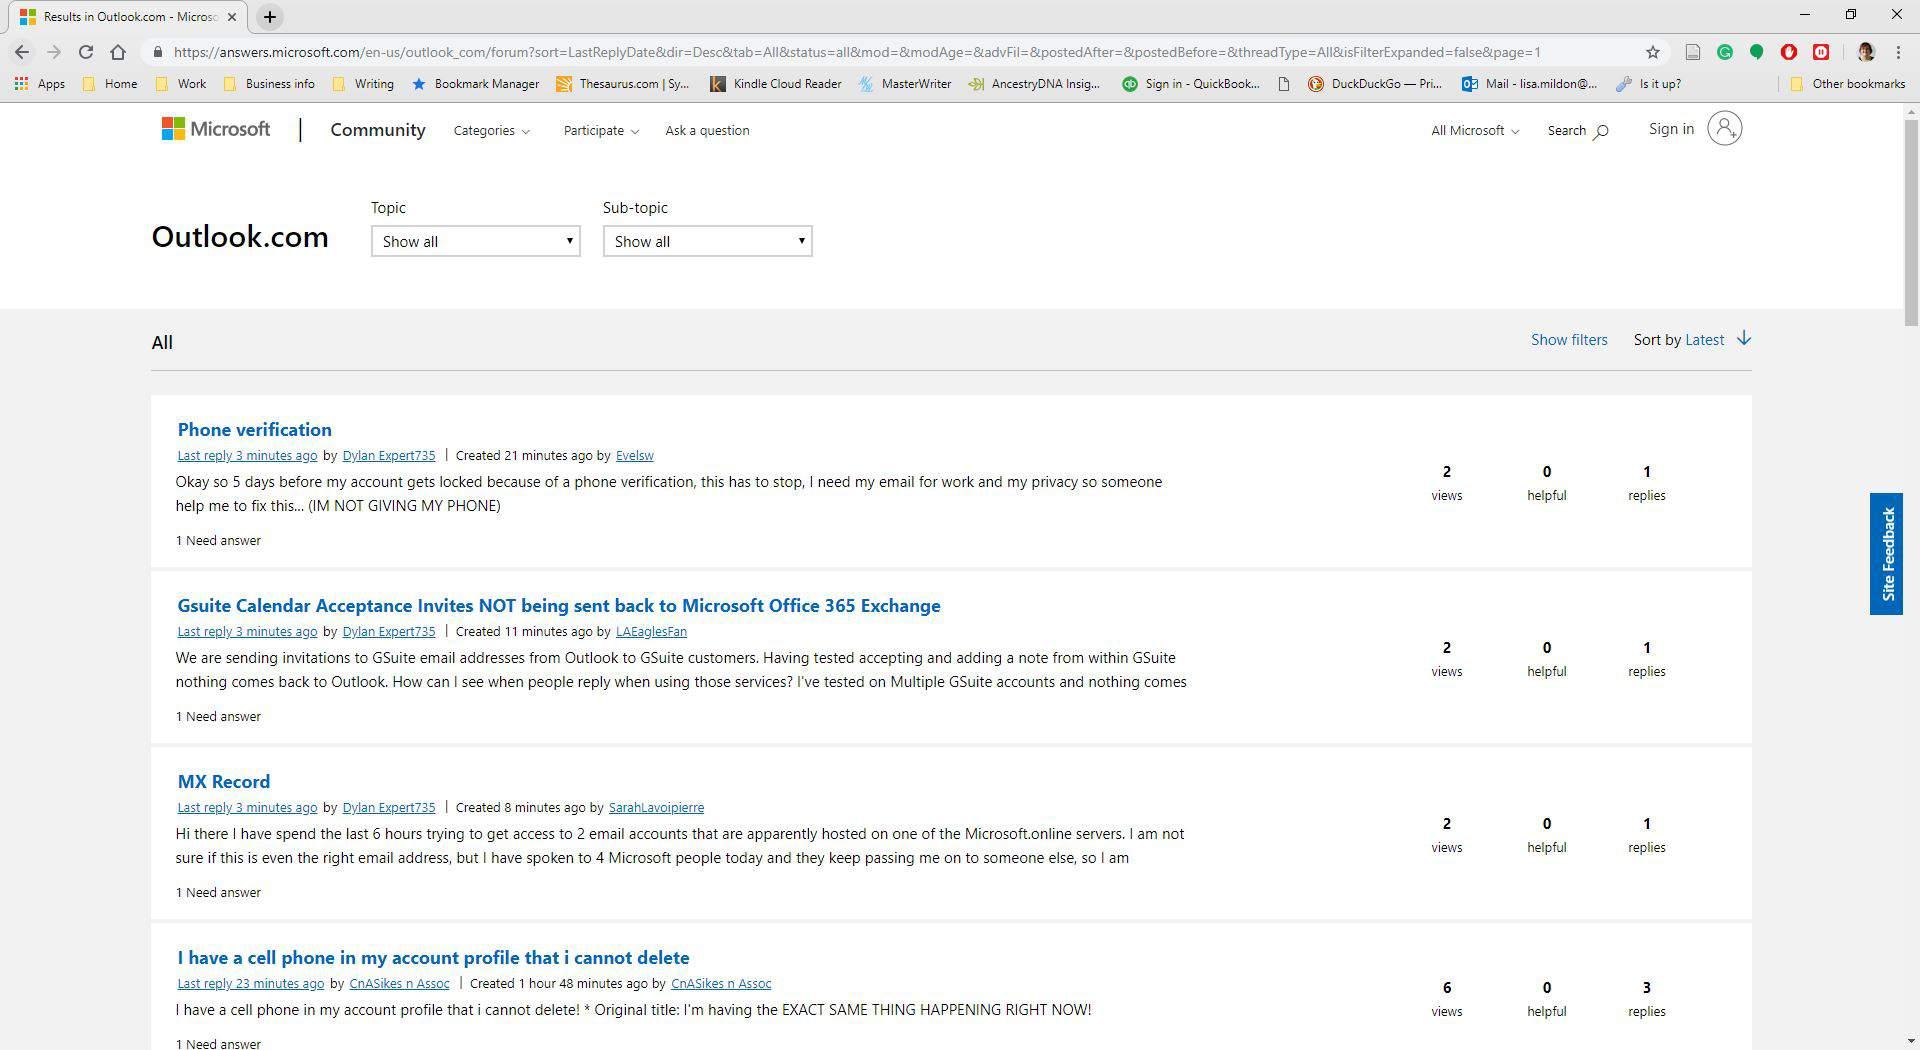 Microsoft's Outlook.com Forum community website.